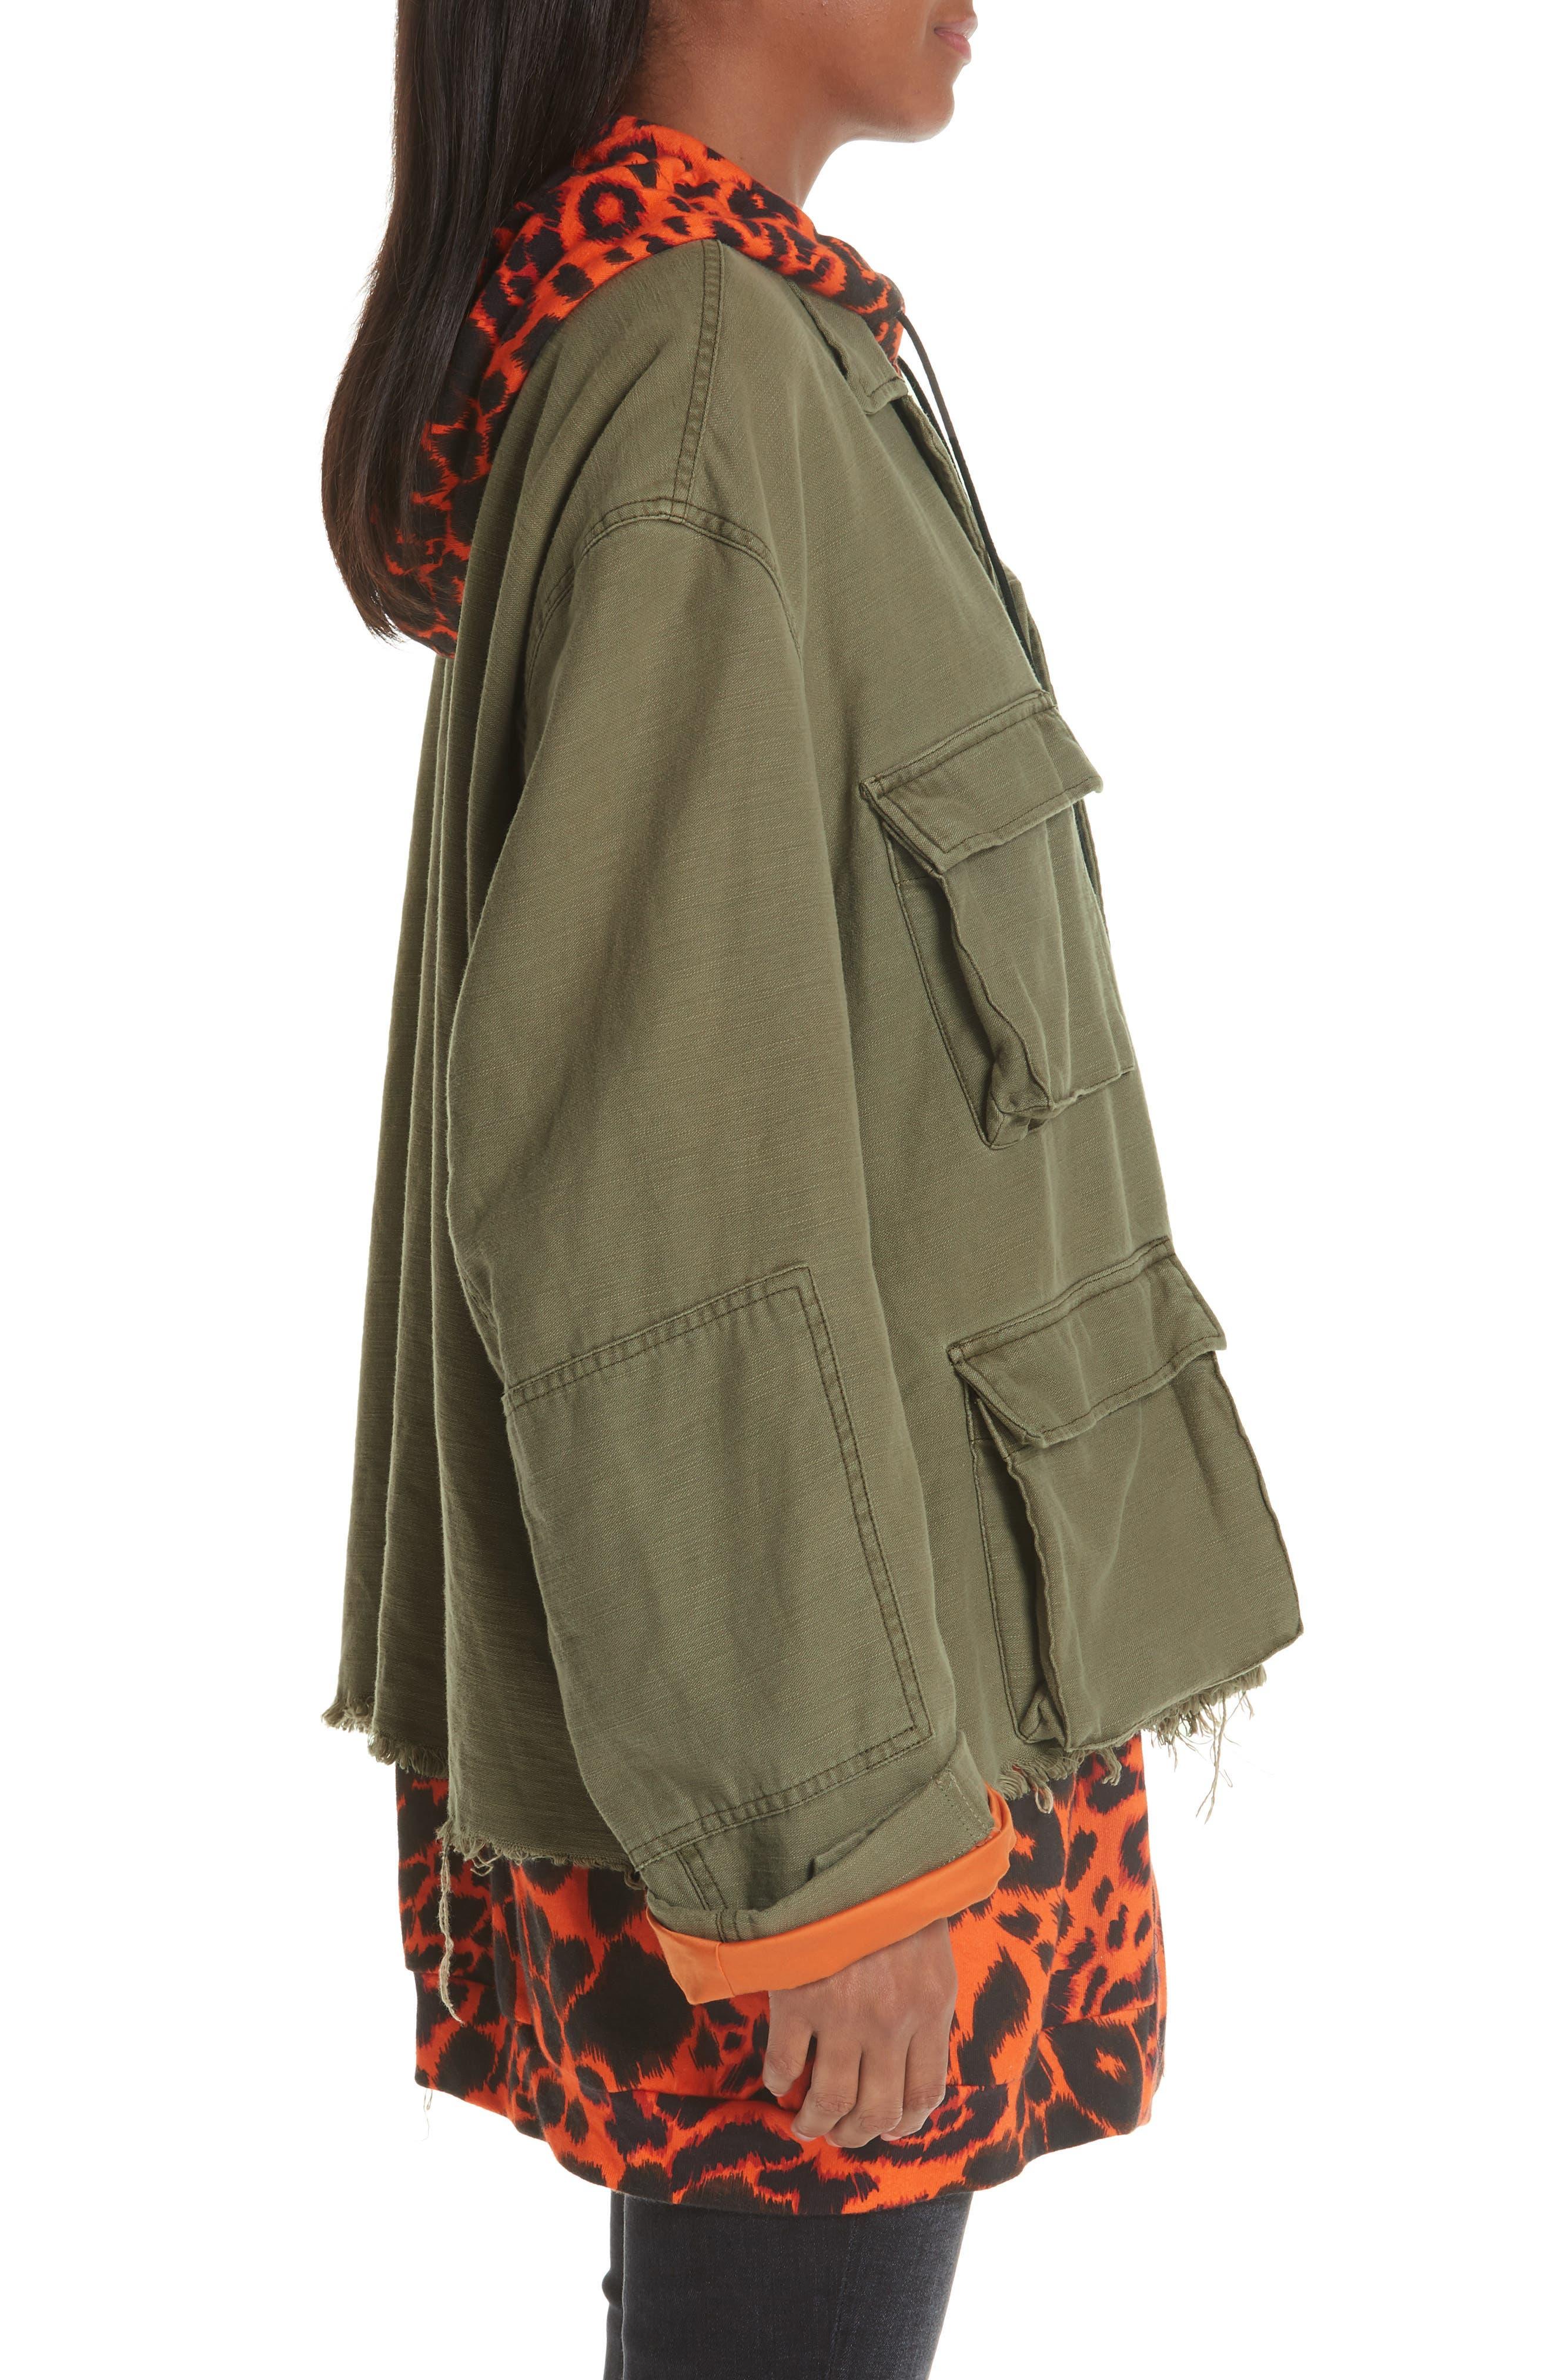 Abu Jacket with Long Leopard Print Hoodie,                             Alternate thumbnail 3, color,                             OLIVE/ ORANGE